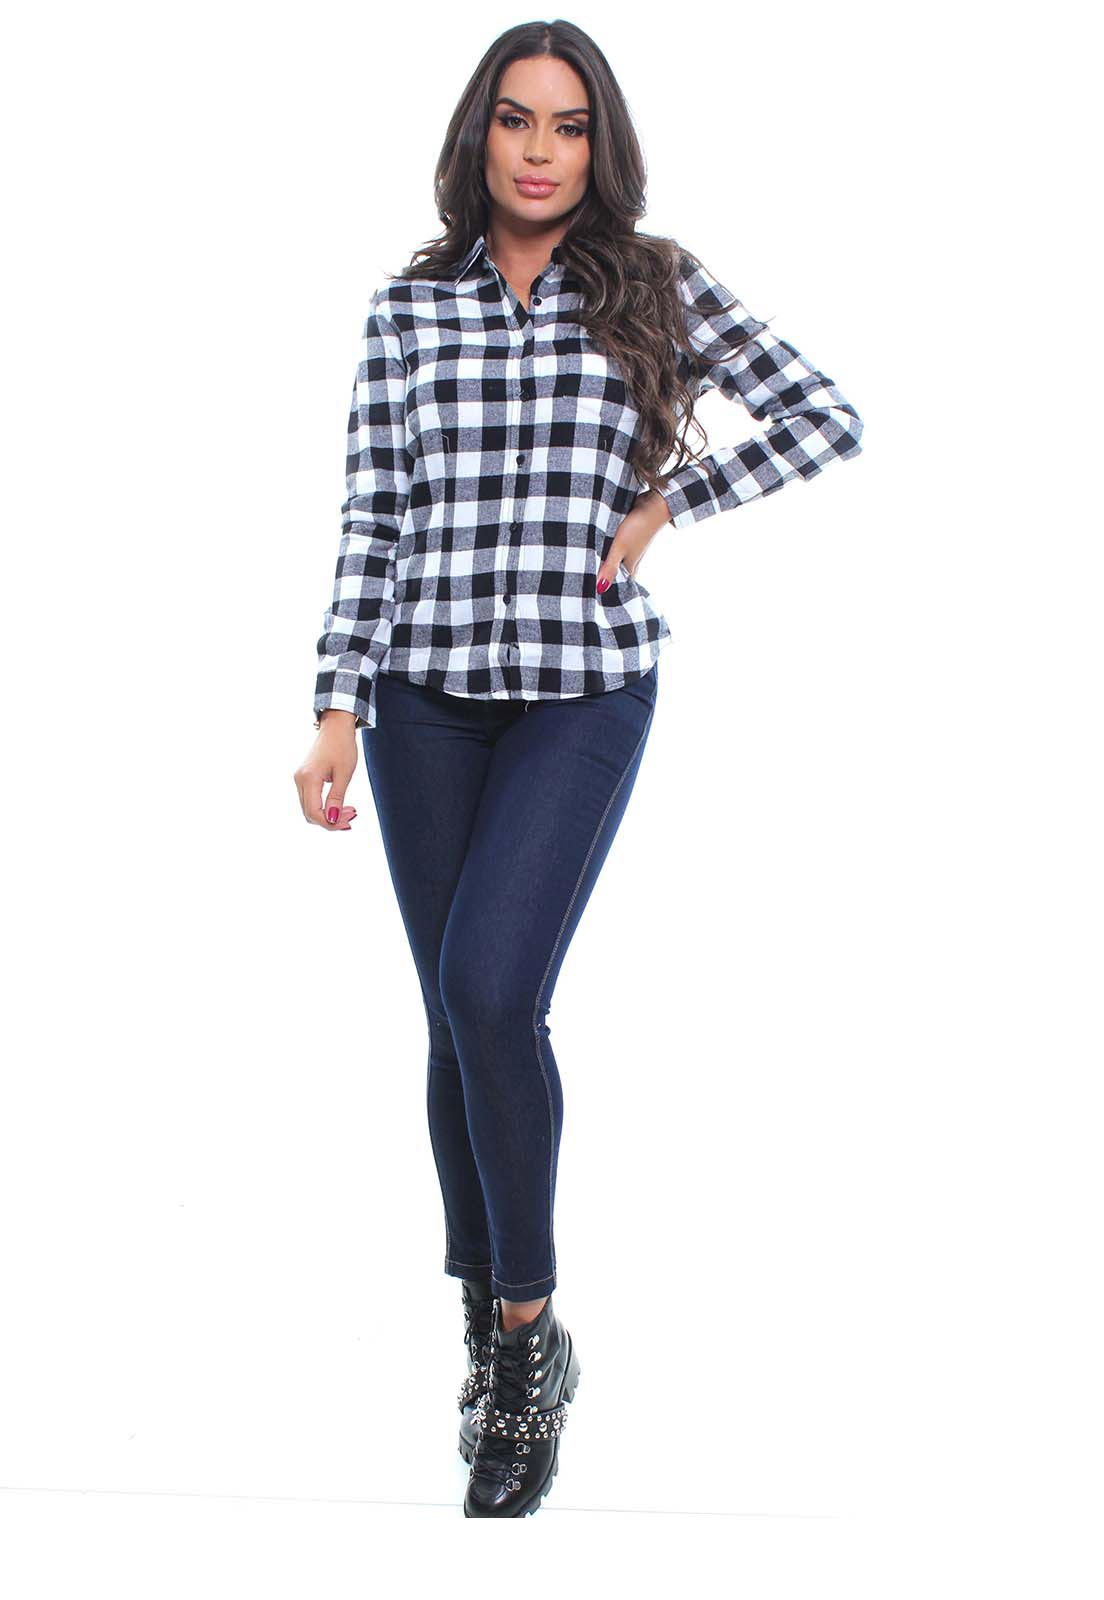 Camisa Feminina Flanelada Manga Longa Crocker - 46891  - CROCKER JEANS